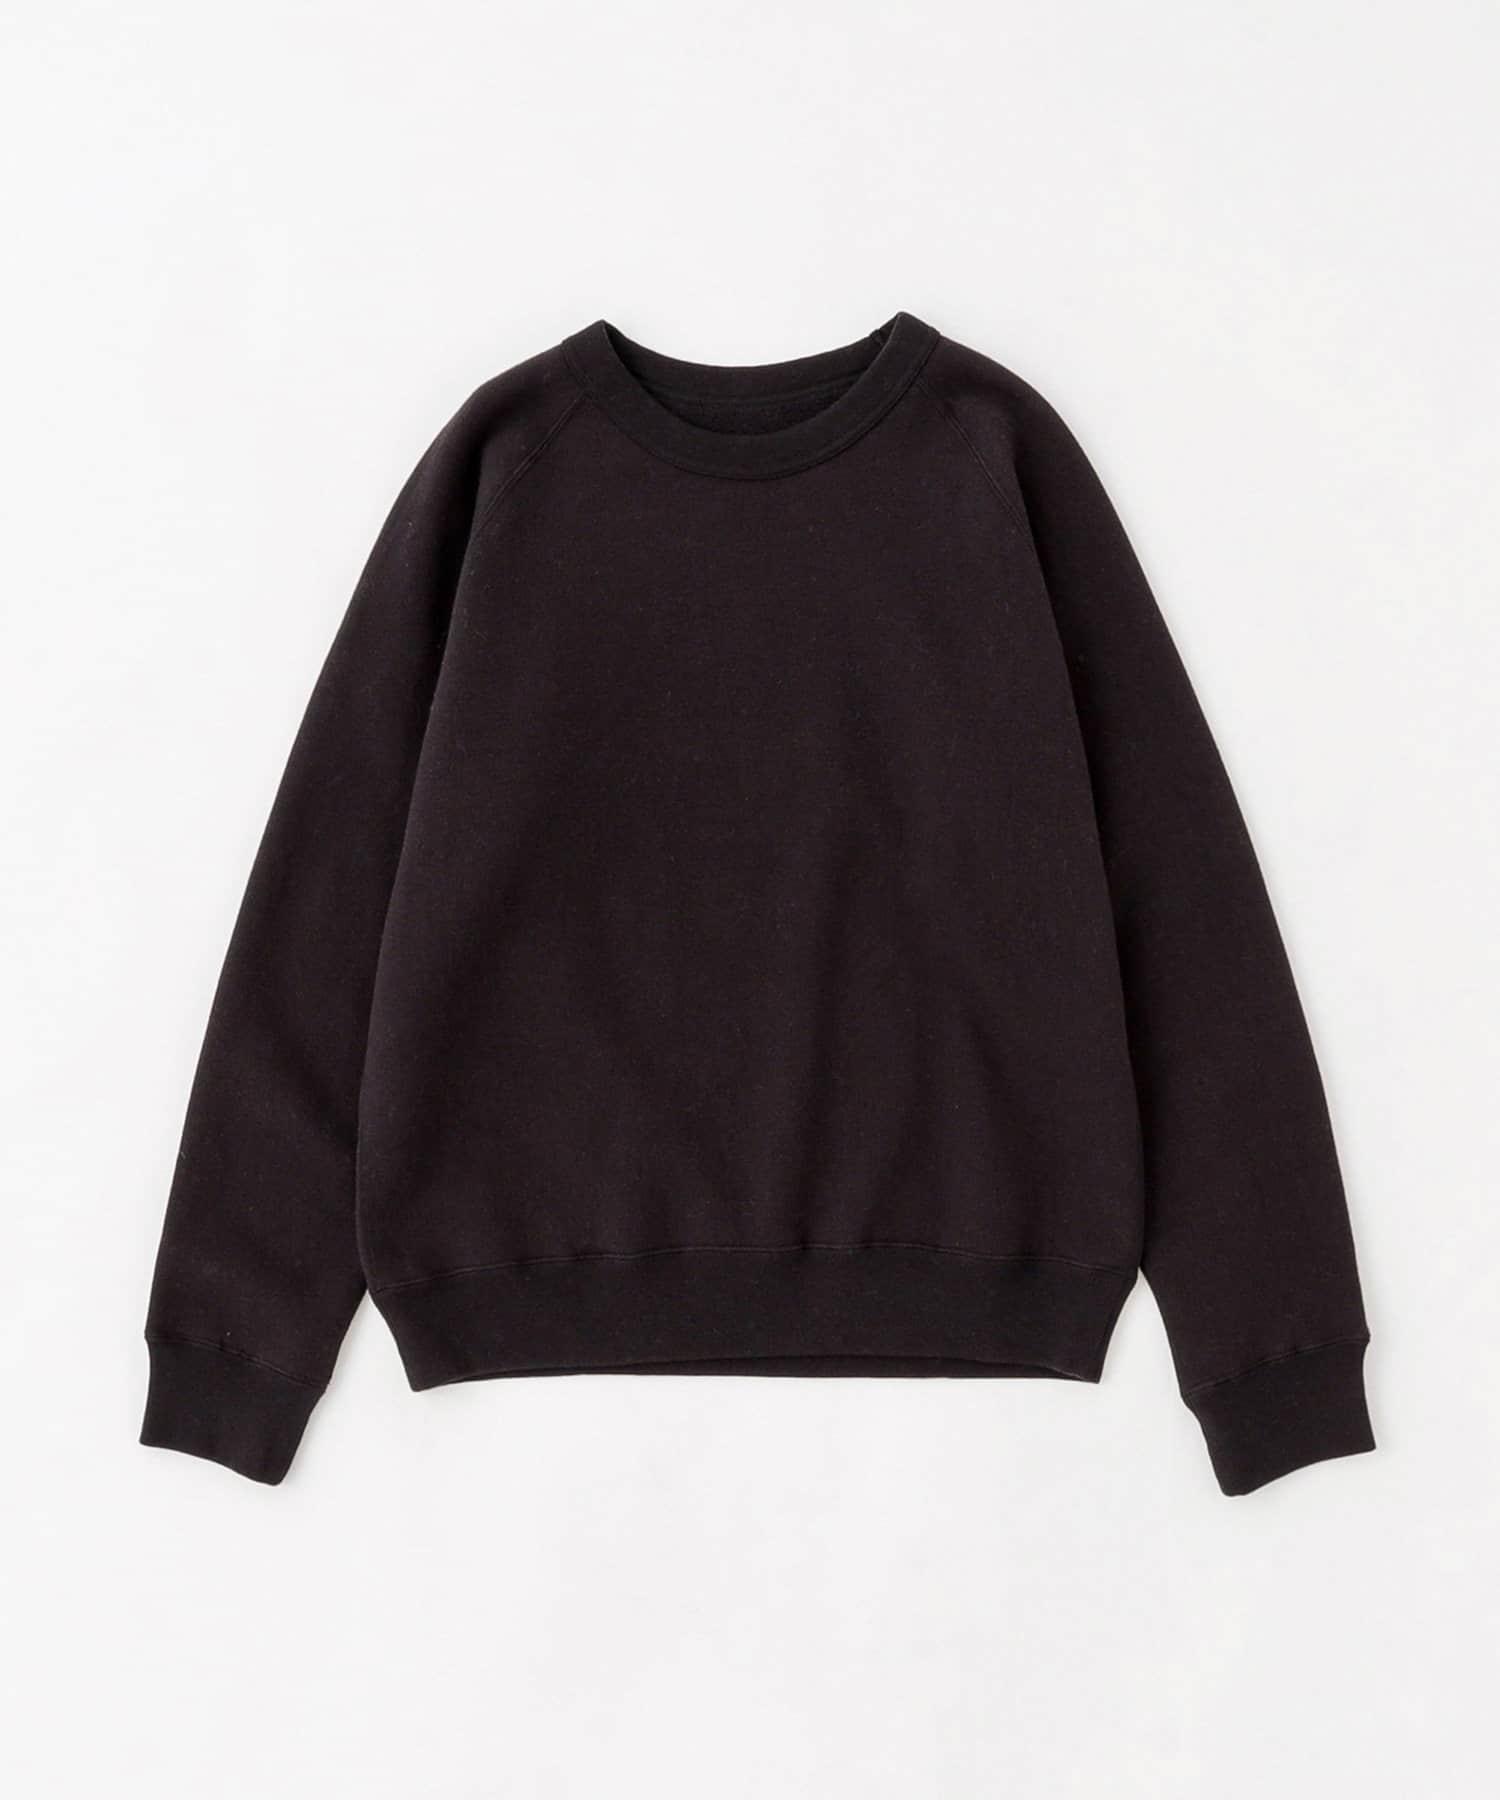 BLOOM&BRANCH(ブルームアンドブランチ) PHLANNÈL SOL / Cotton Yak Sweat Shirt